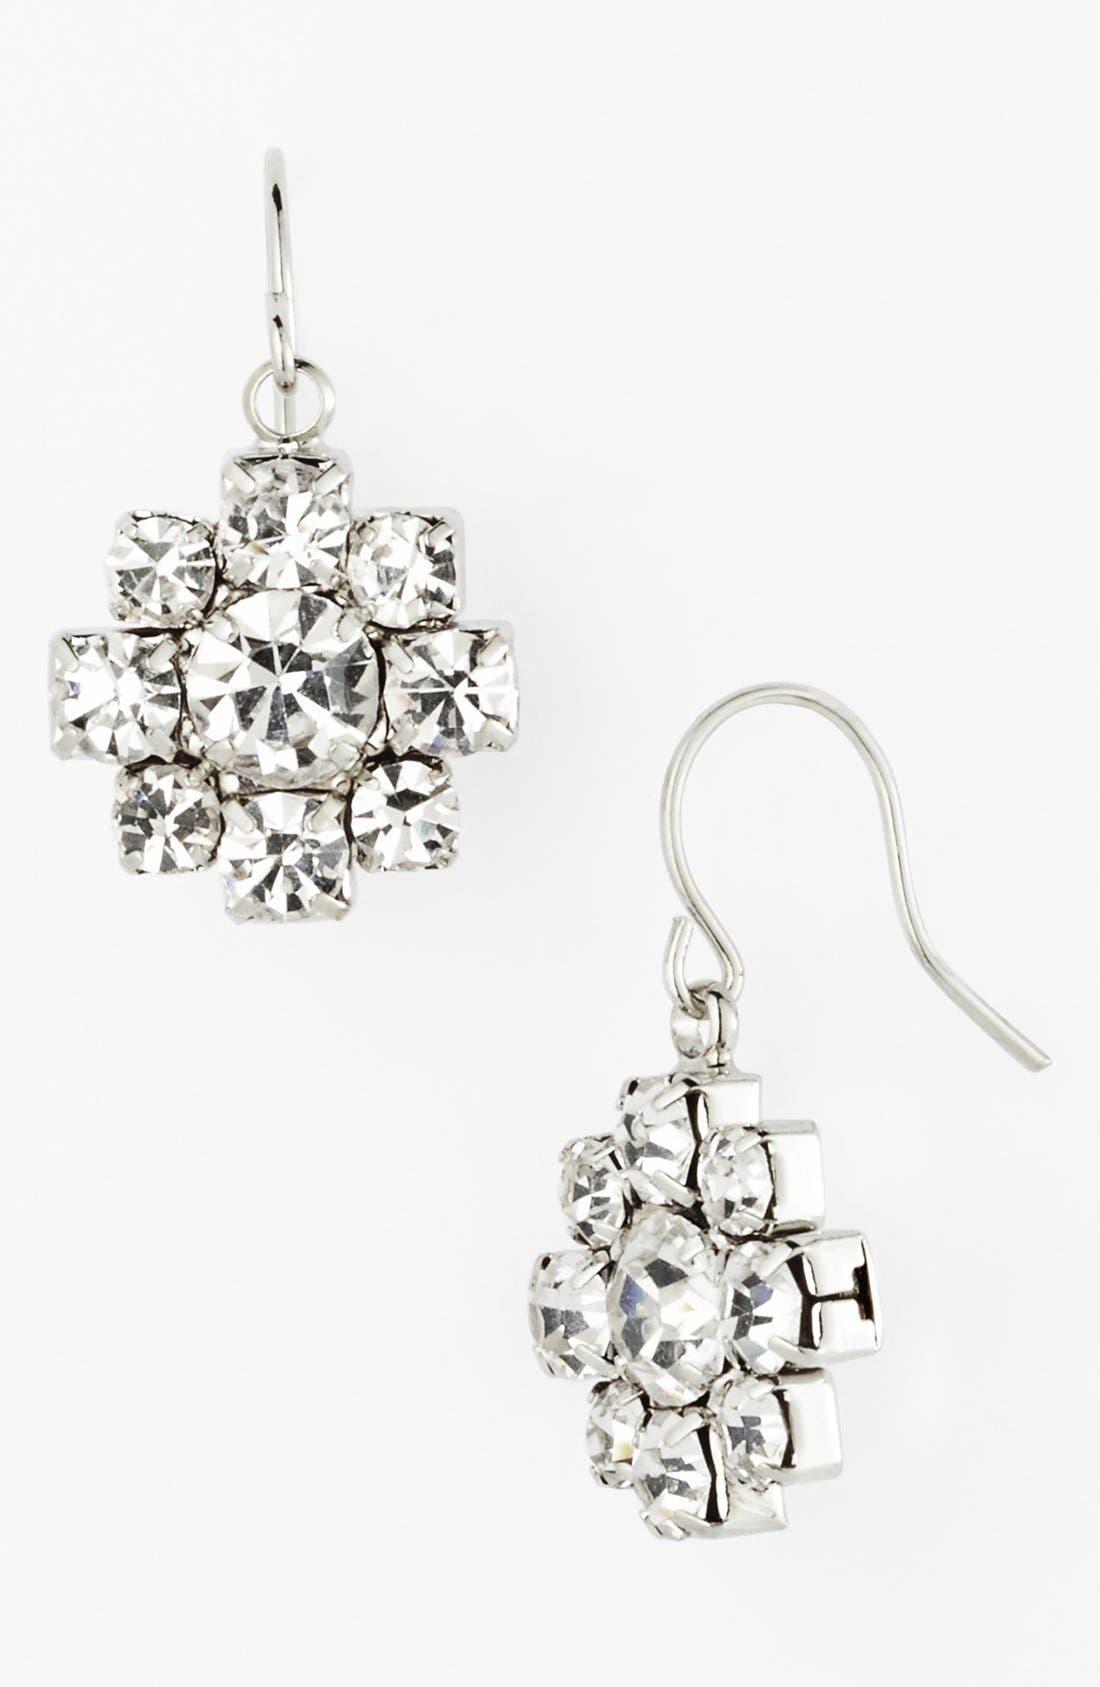 Alternate Image 1 Selected - Nordstrom 'Occasion' Crystal Drop Earrings